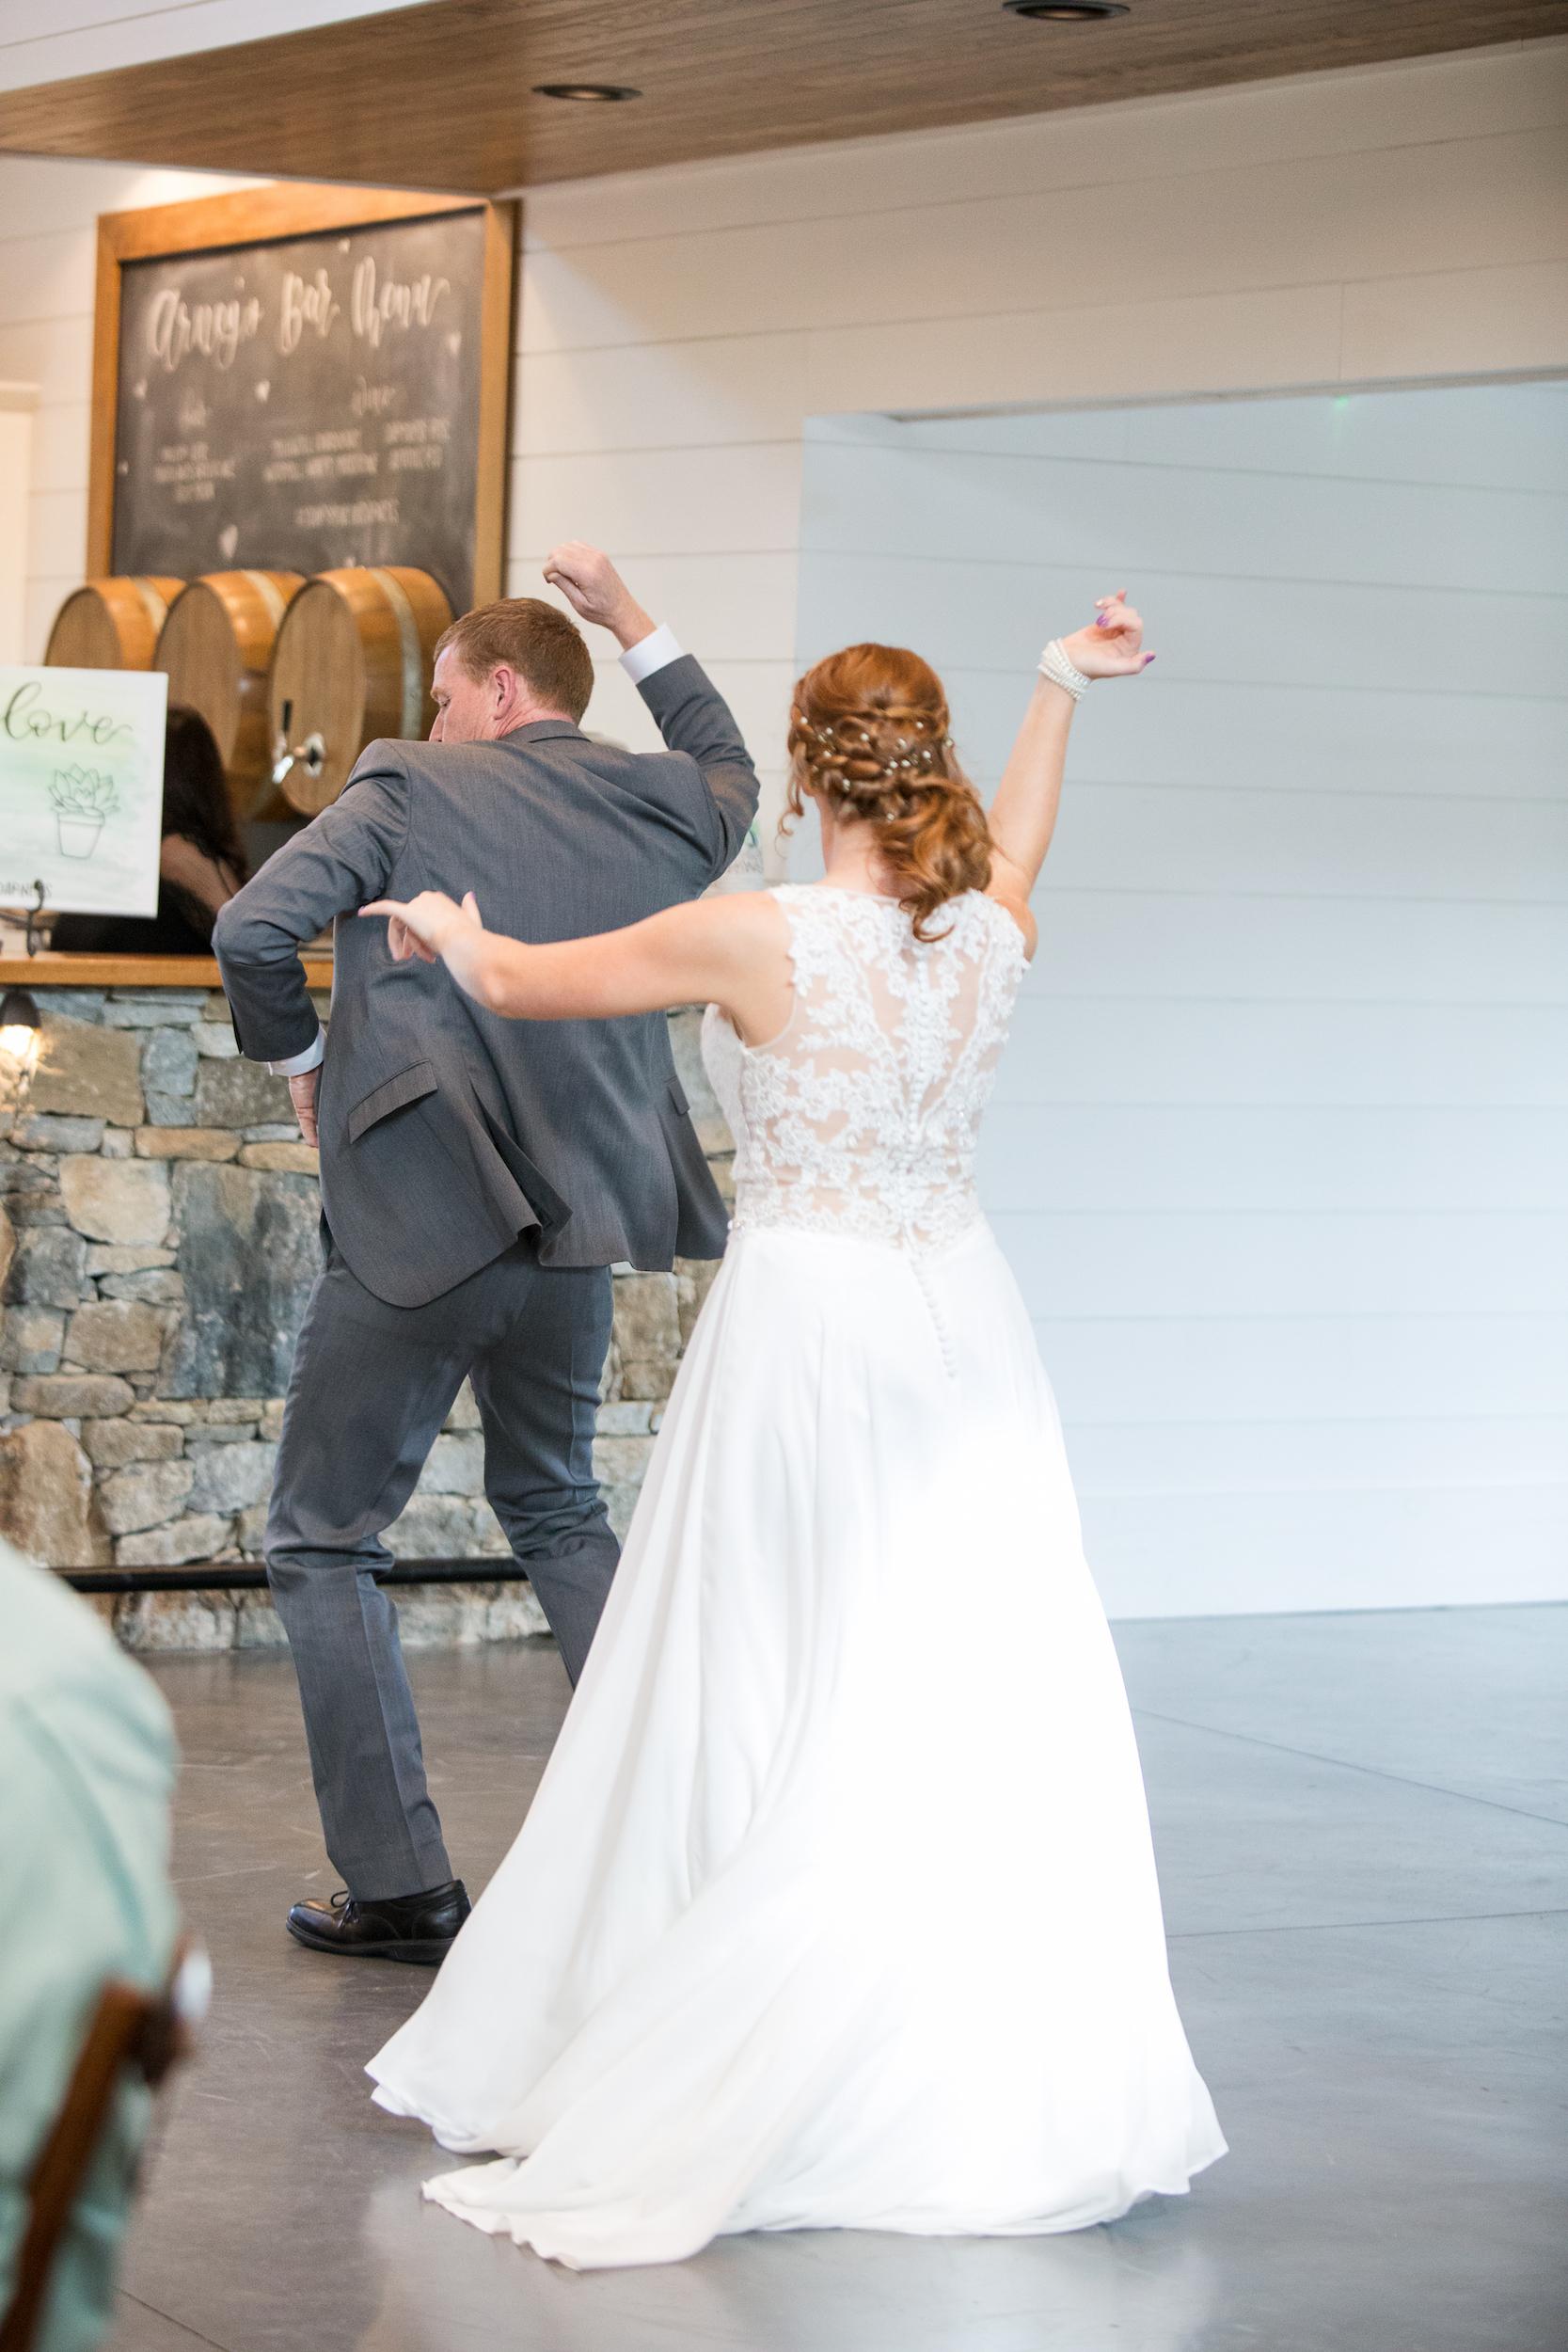 Joy-Unscripted-Wedding-Calligraphy-Arney-726.jpg